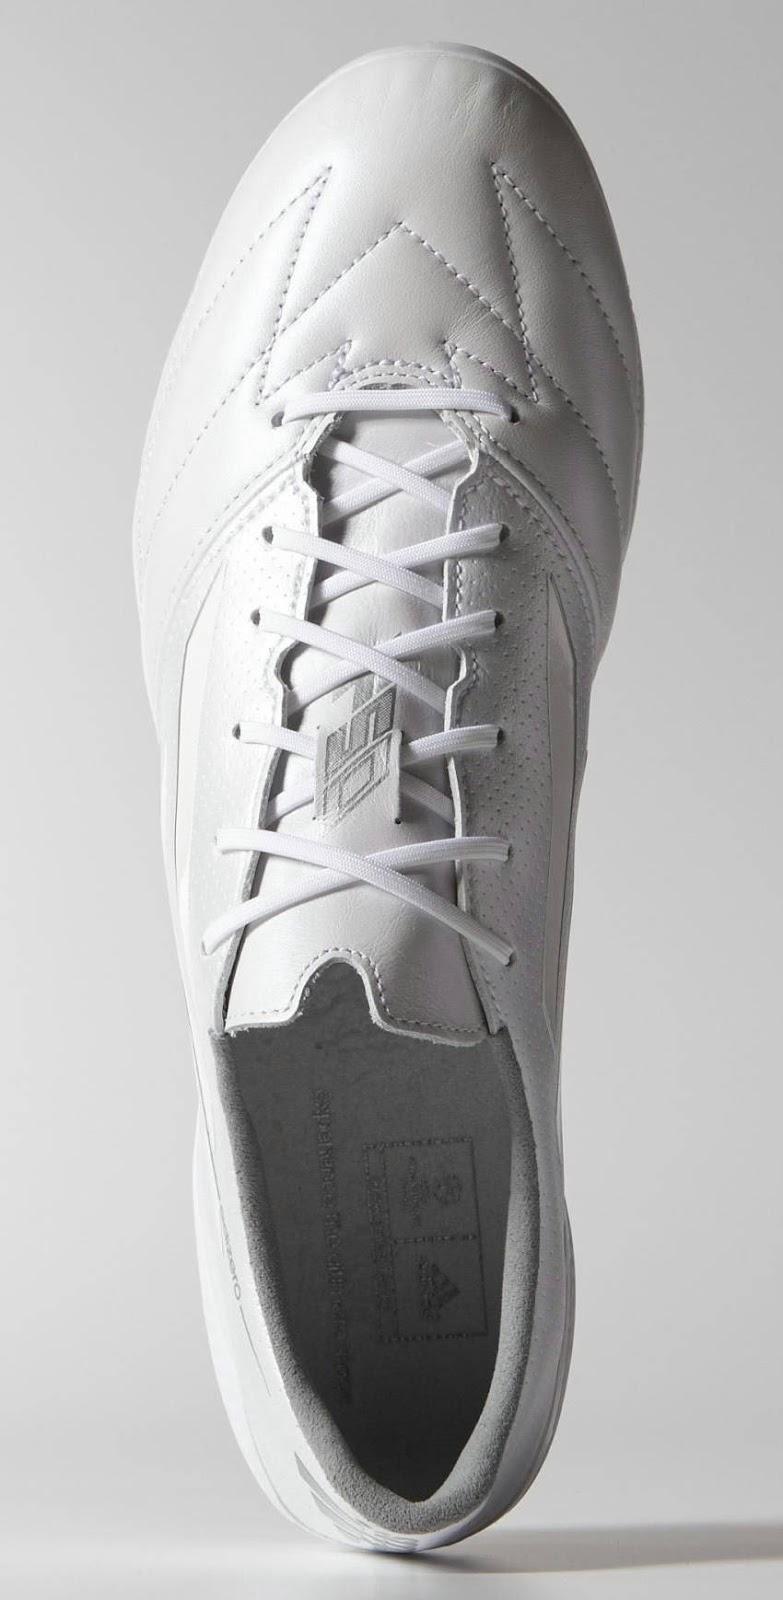 adidas f50 adizero whiteout conditions